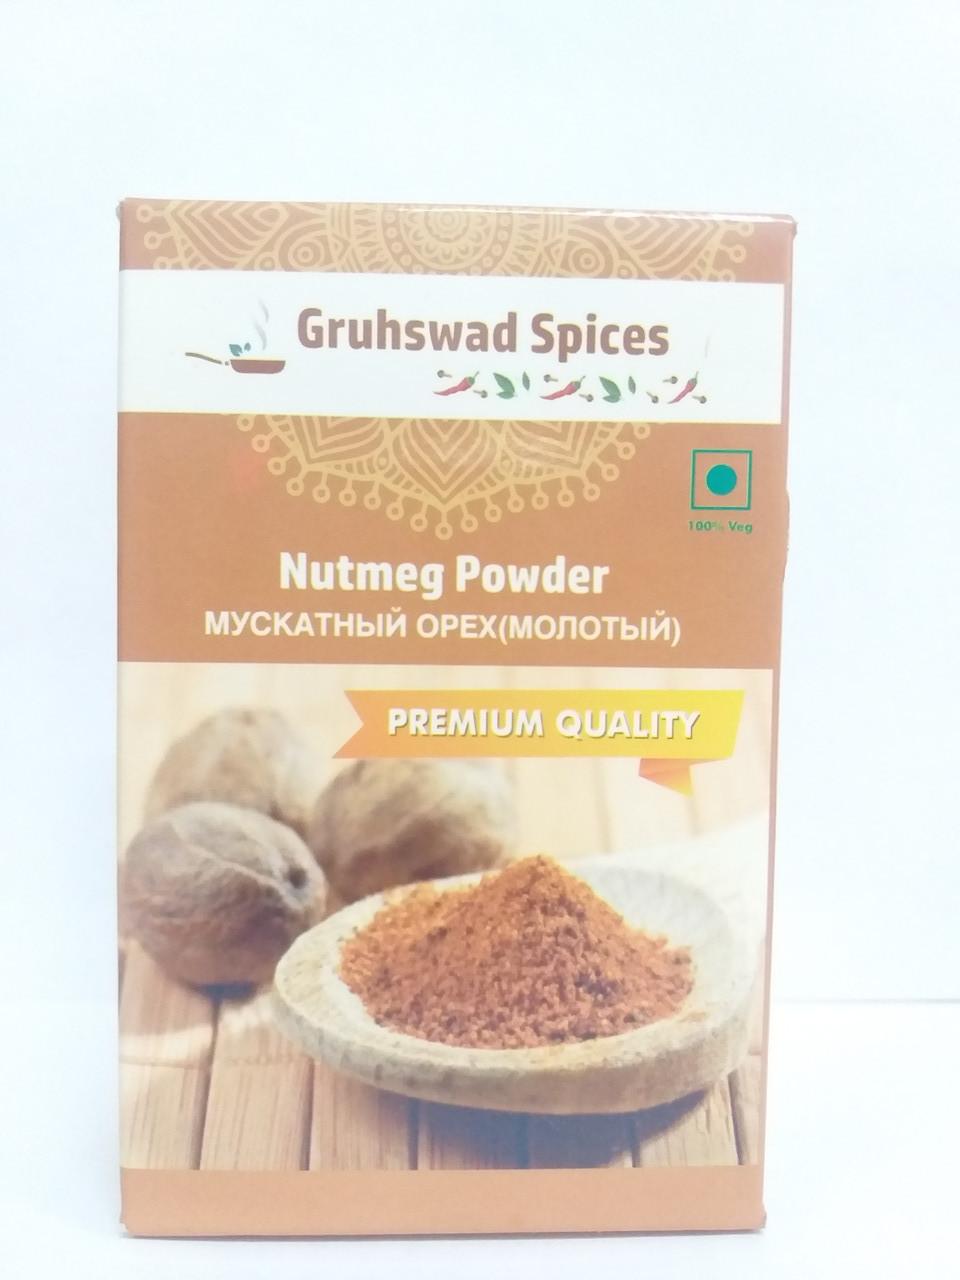 Мускатный орех молотый, 50 гр, Gruhswad Spices